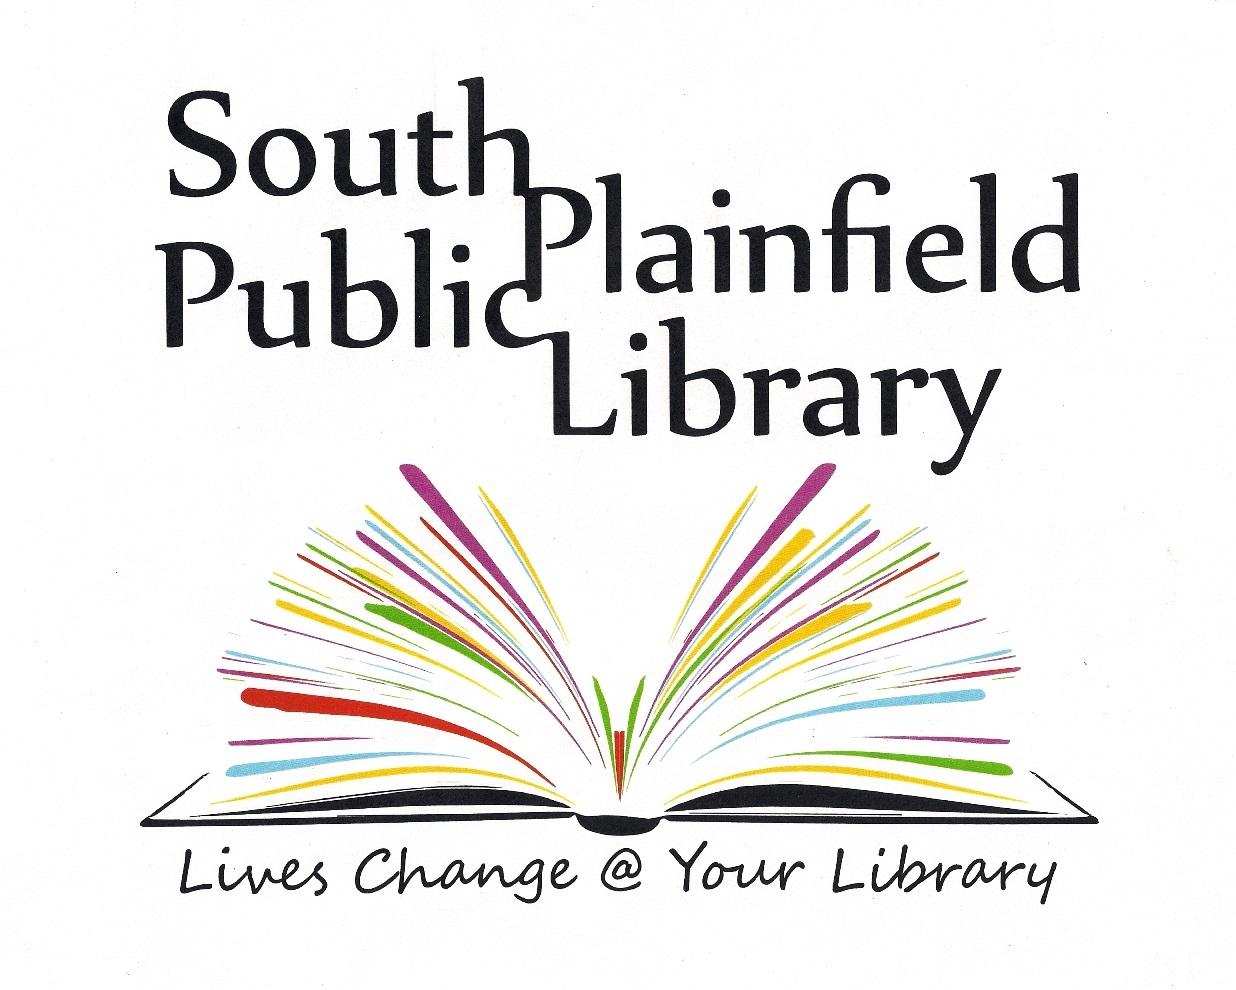 085e98091362649819b0_Library_logo.jpg